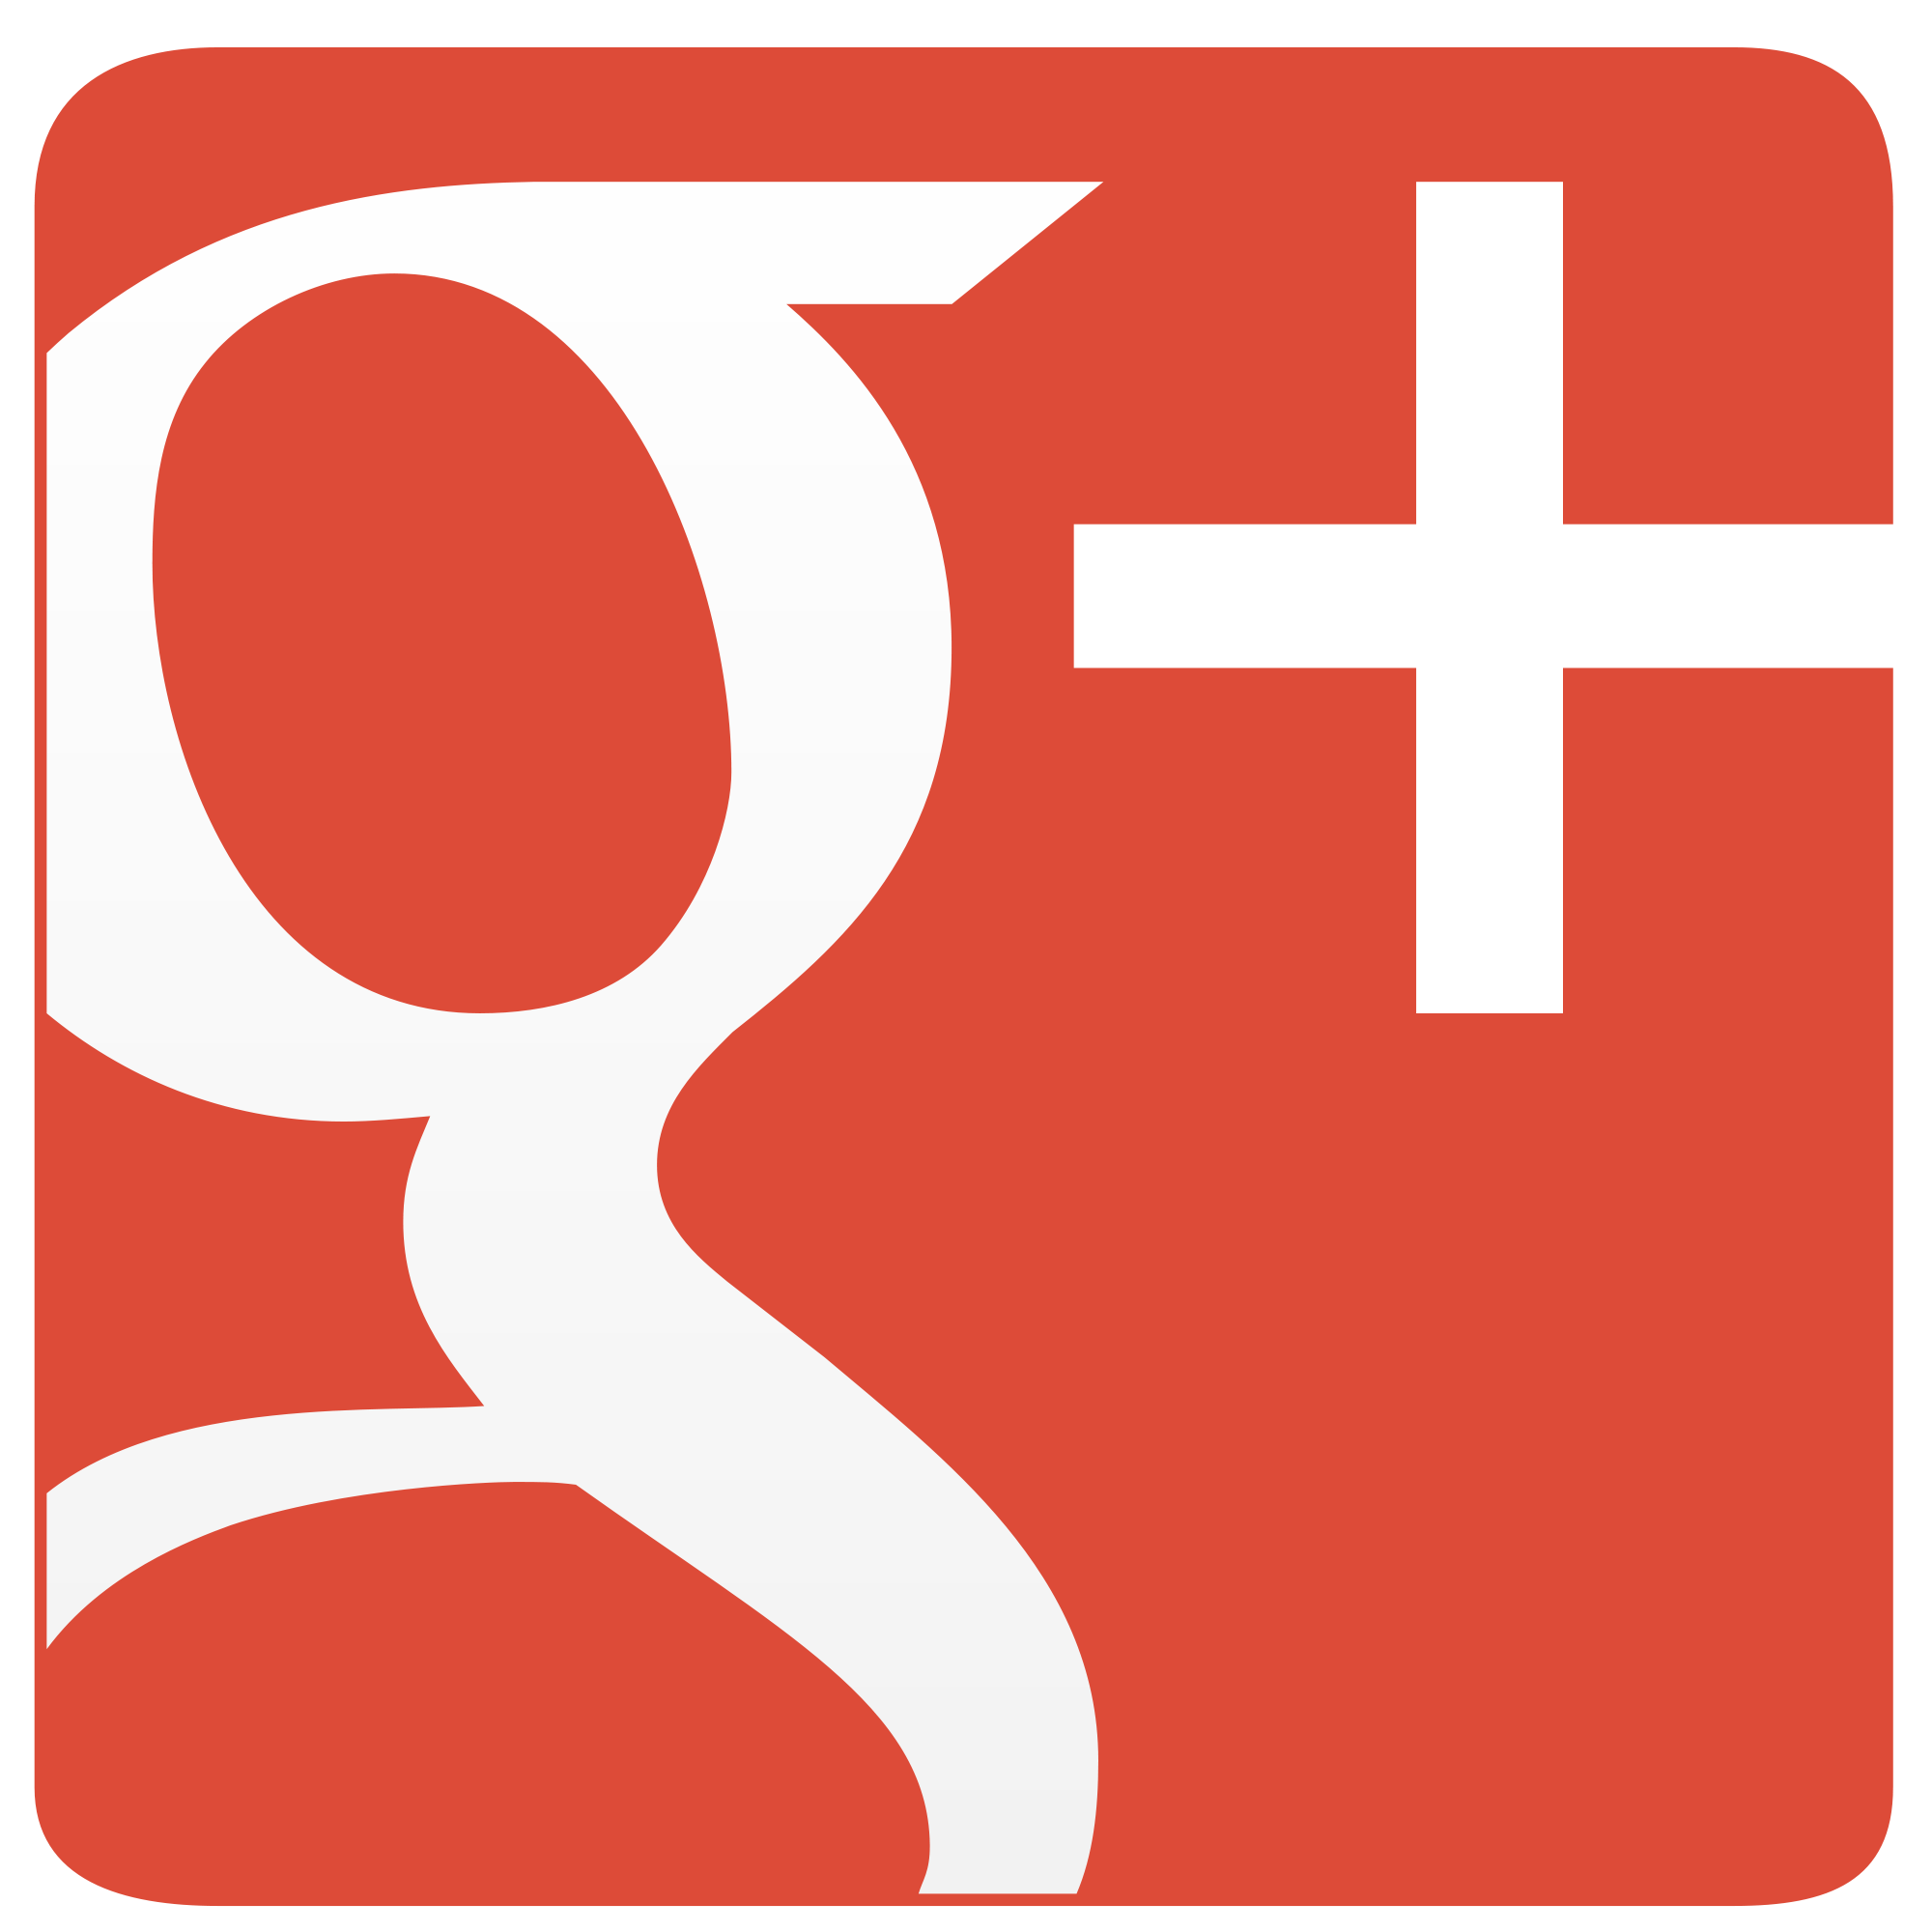 google-plus-icon-hd